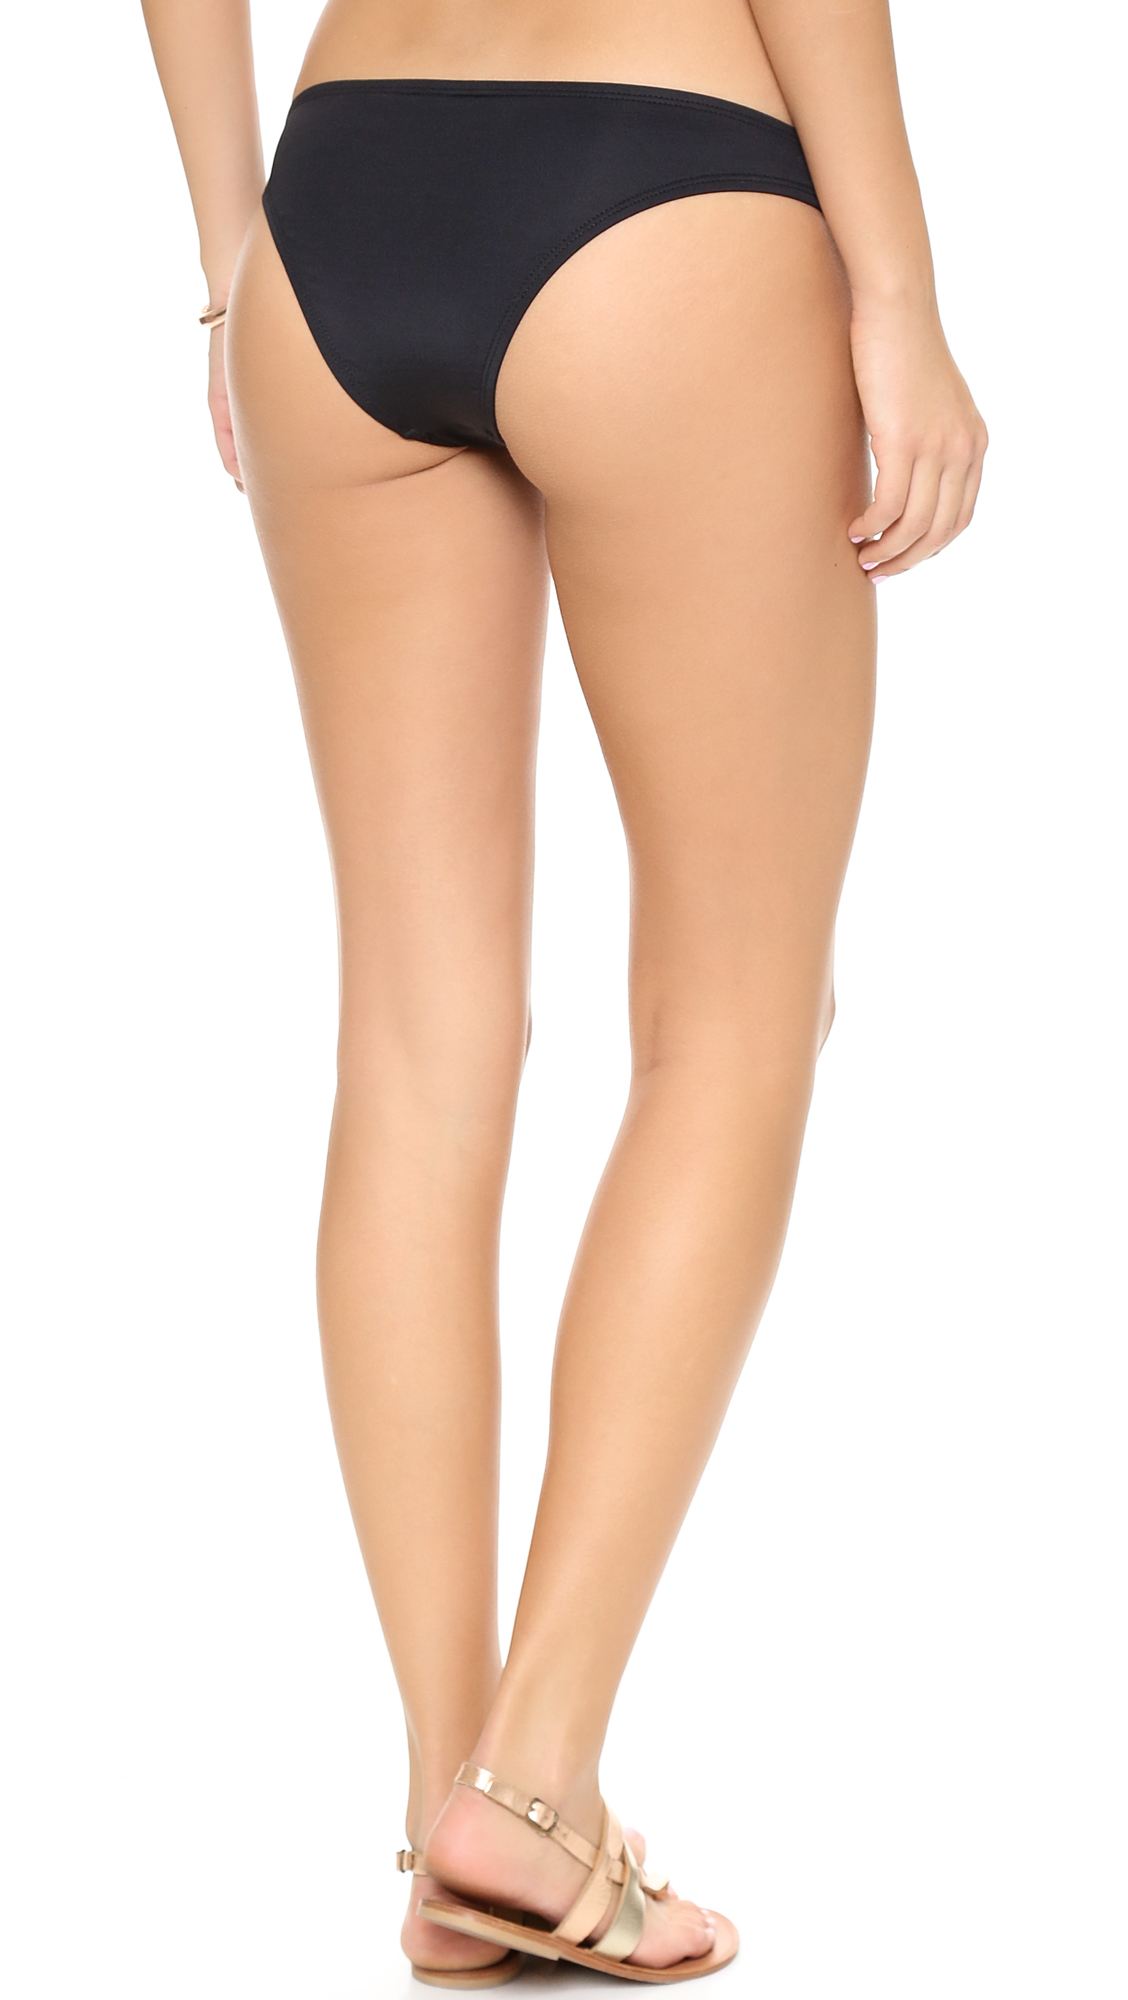 MH Beach Body 8.3: Legs pics